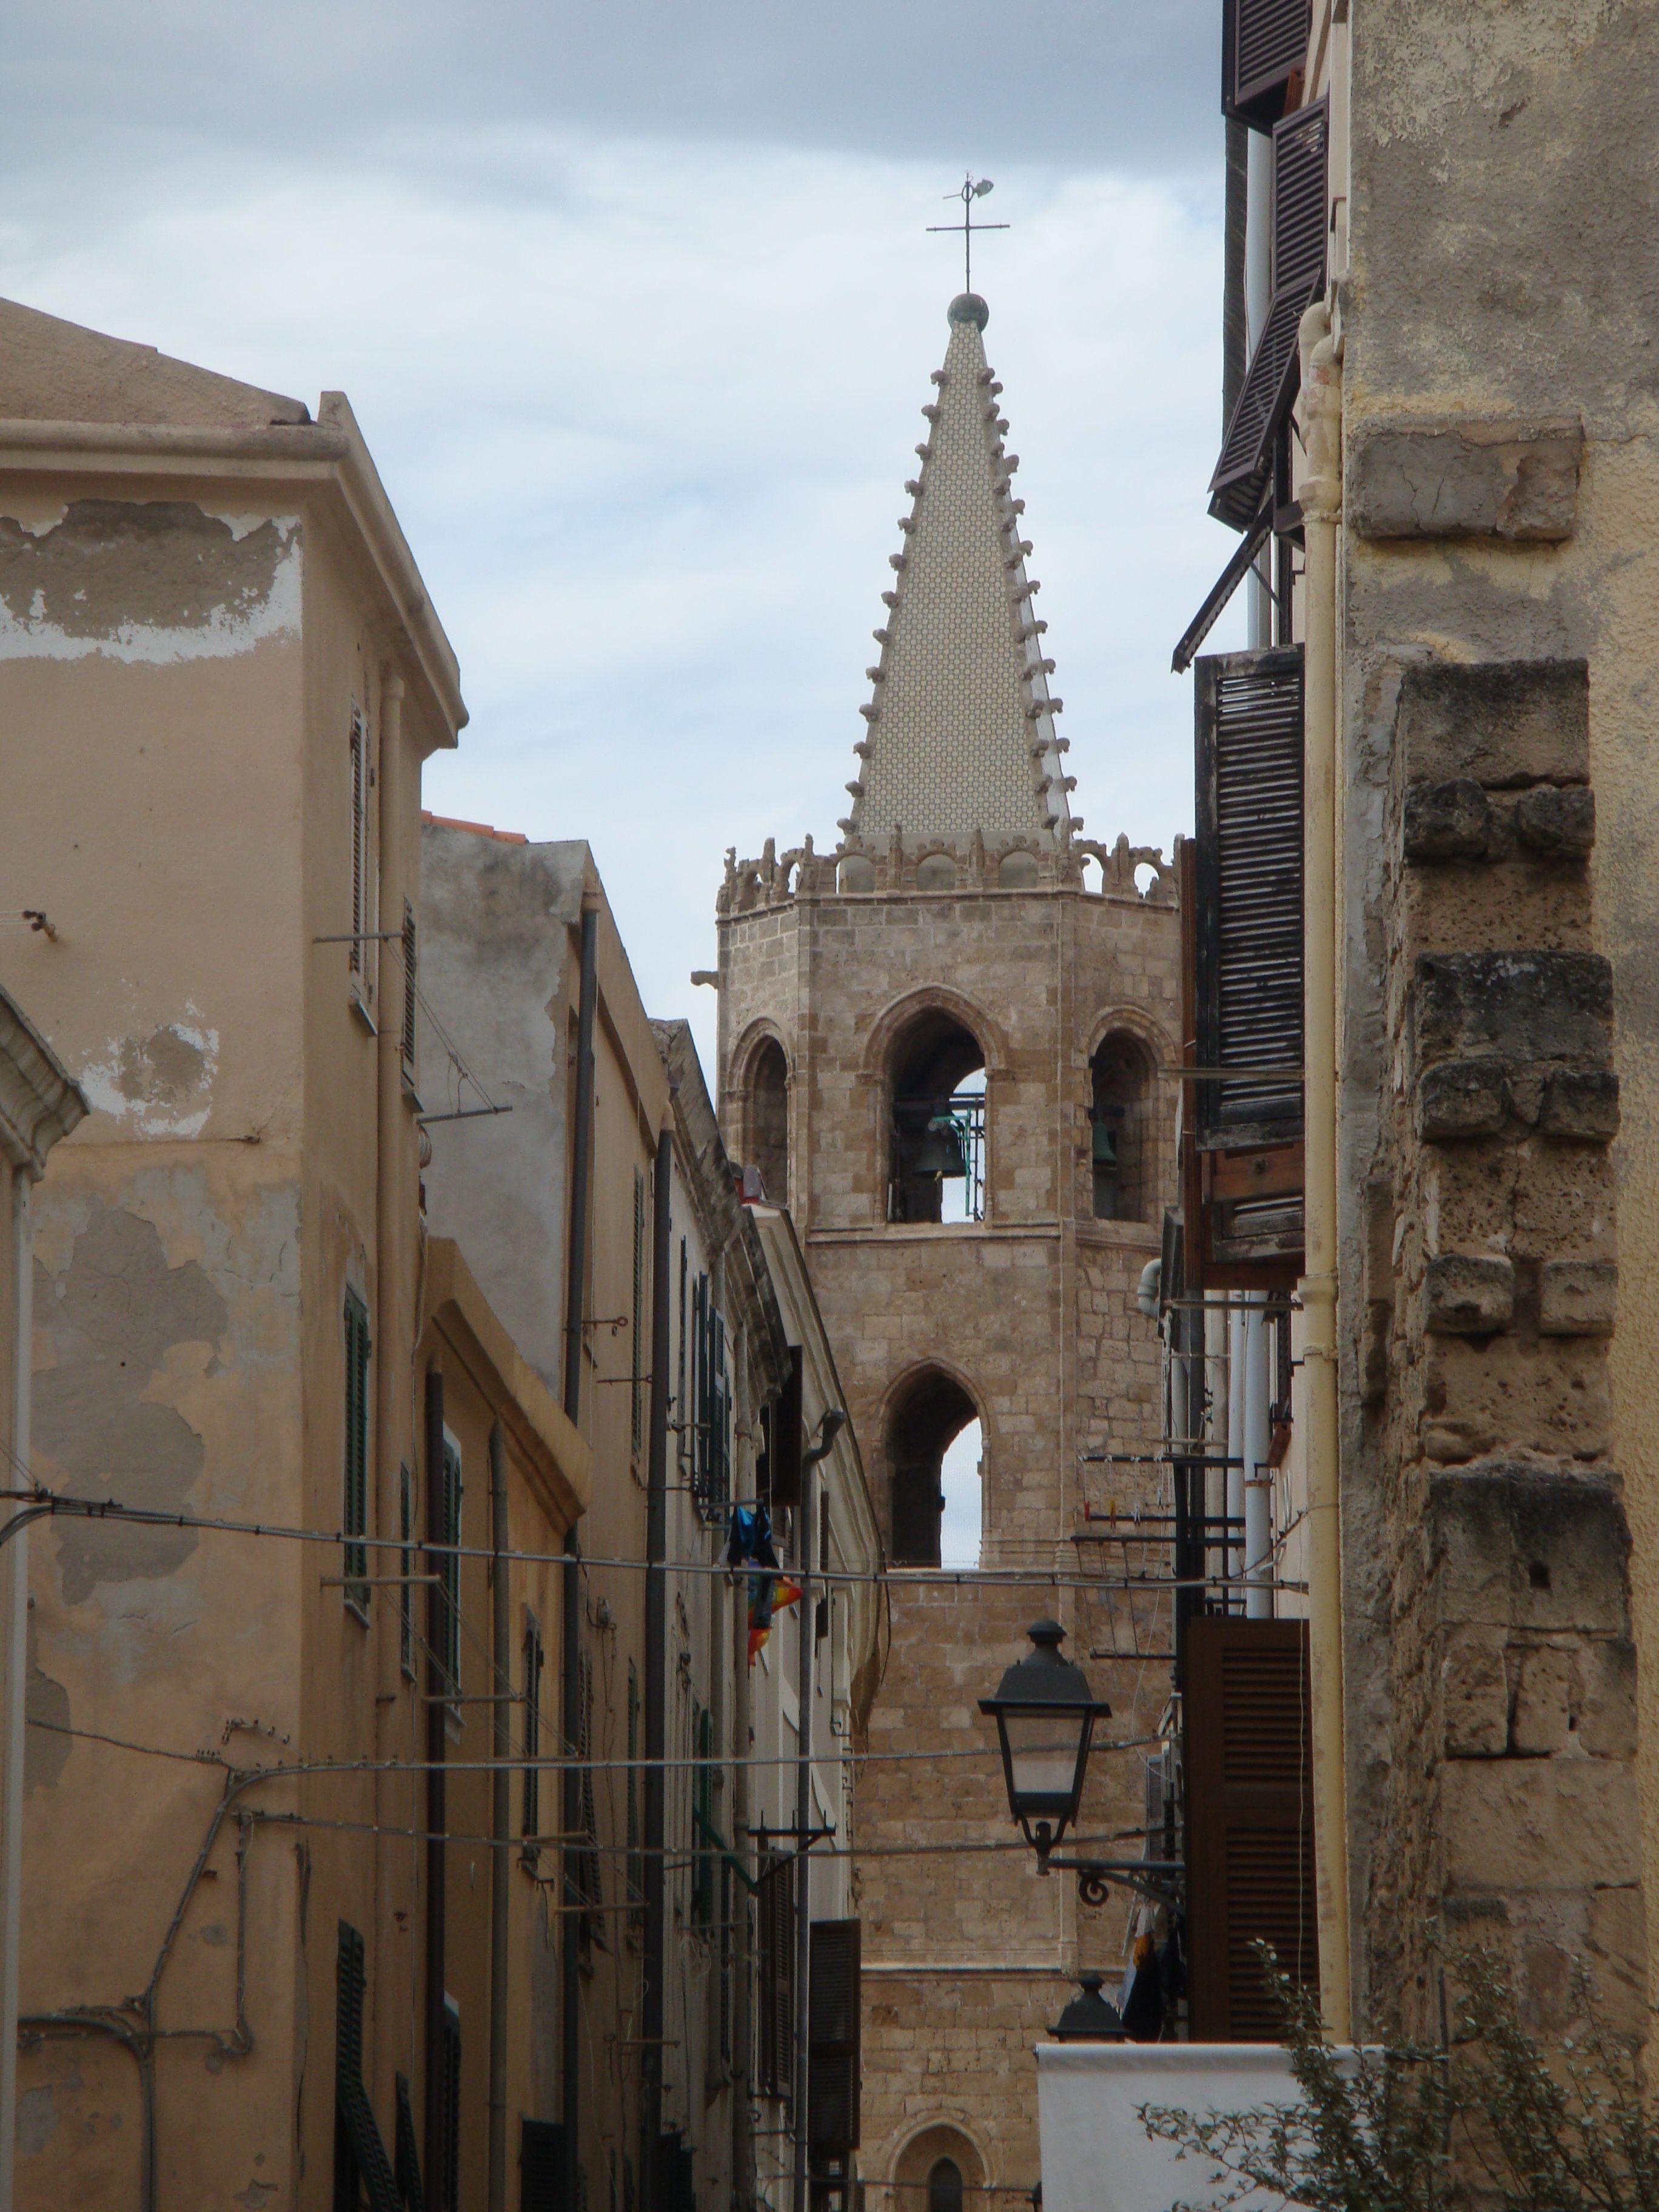 Alghero's Cathedral of Santa Maria  #sardinia #italy #Alghero